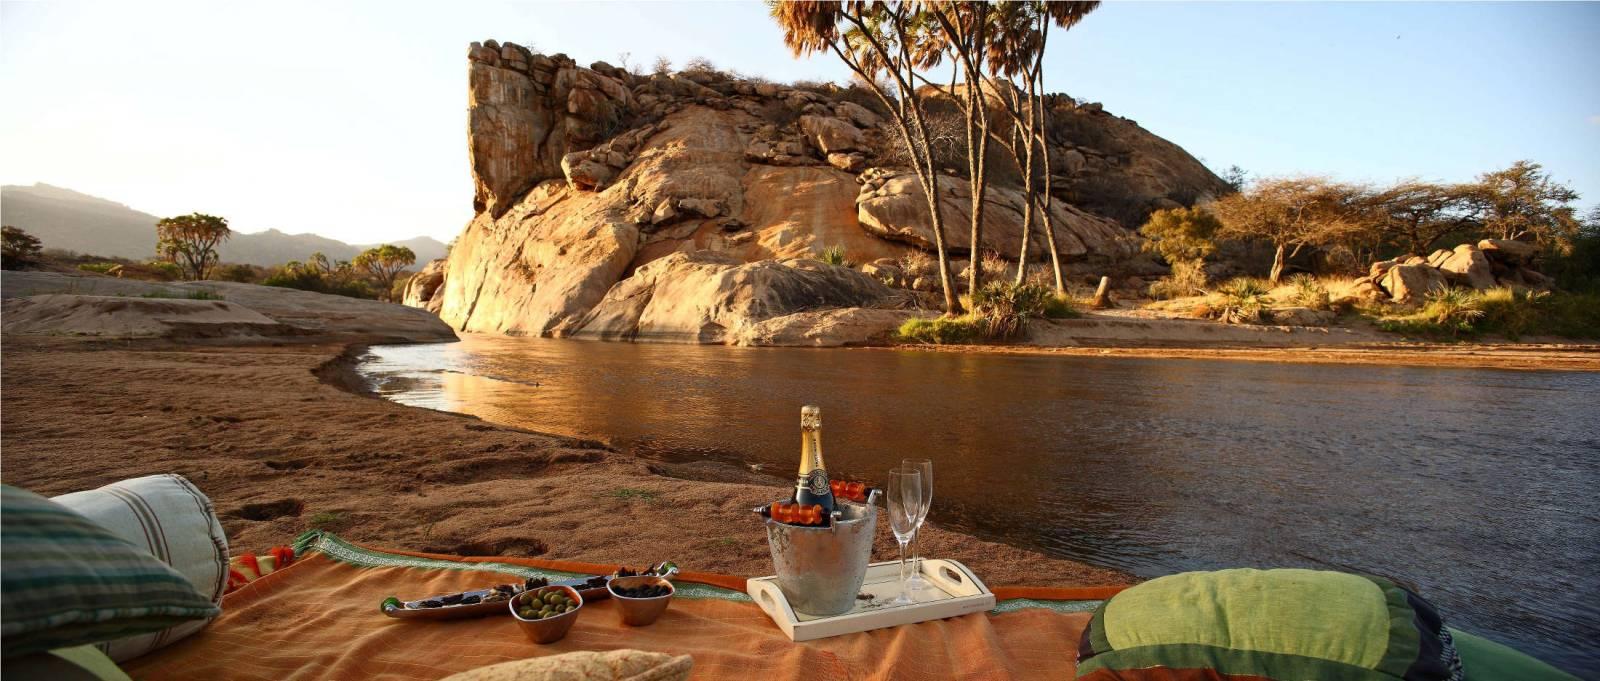 safari-kenya-accomodation-luxury